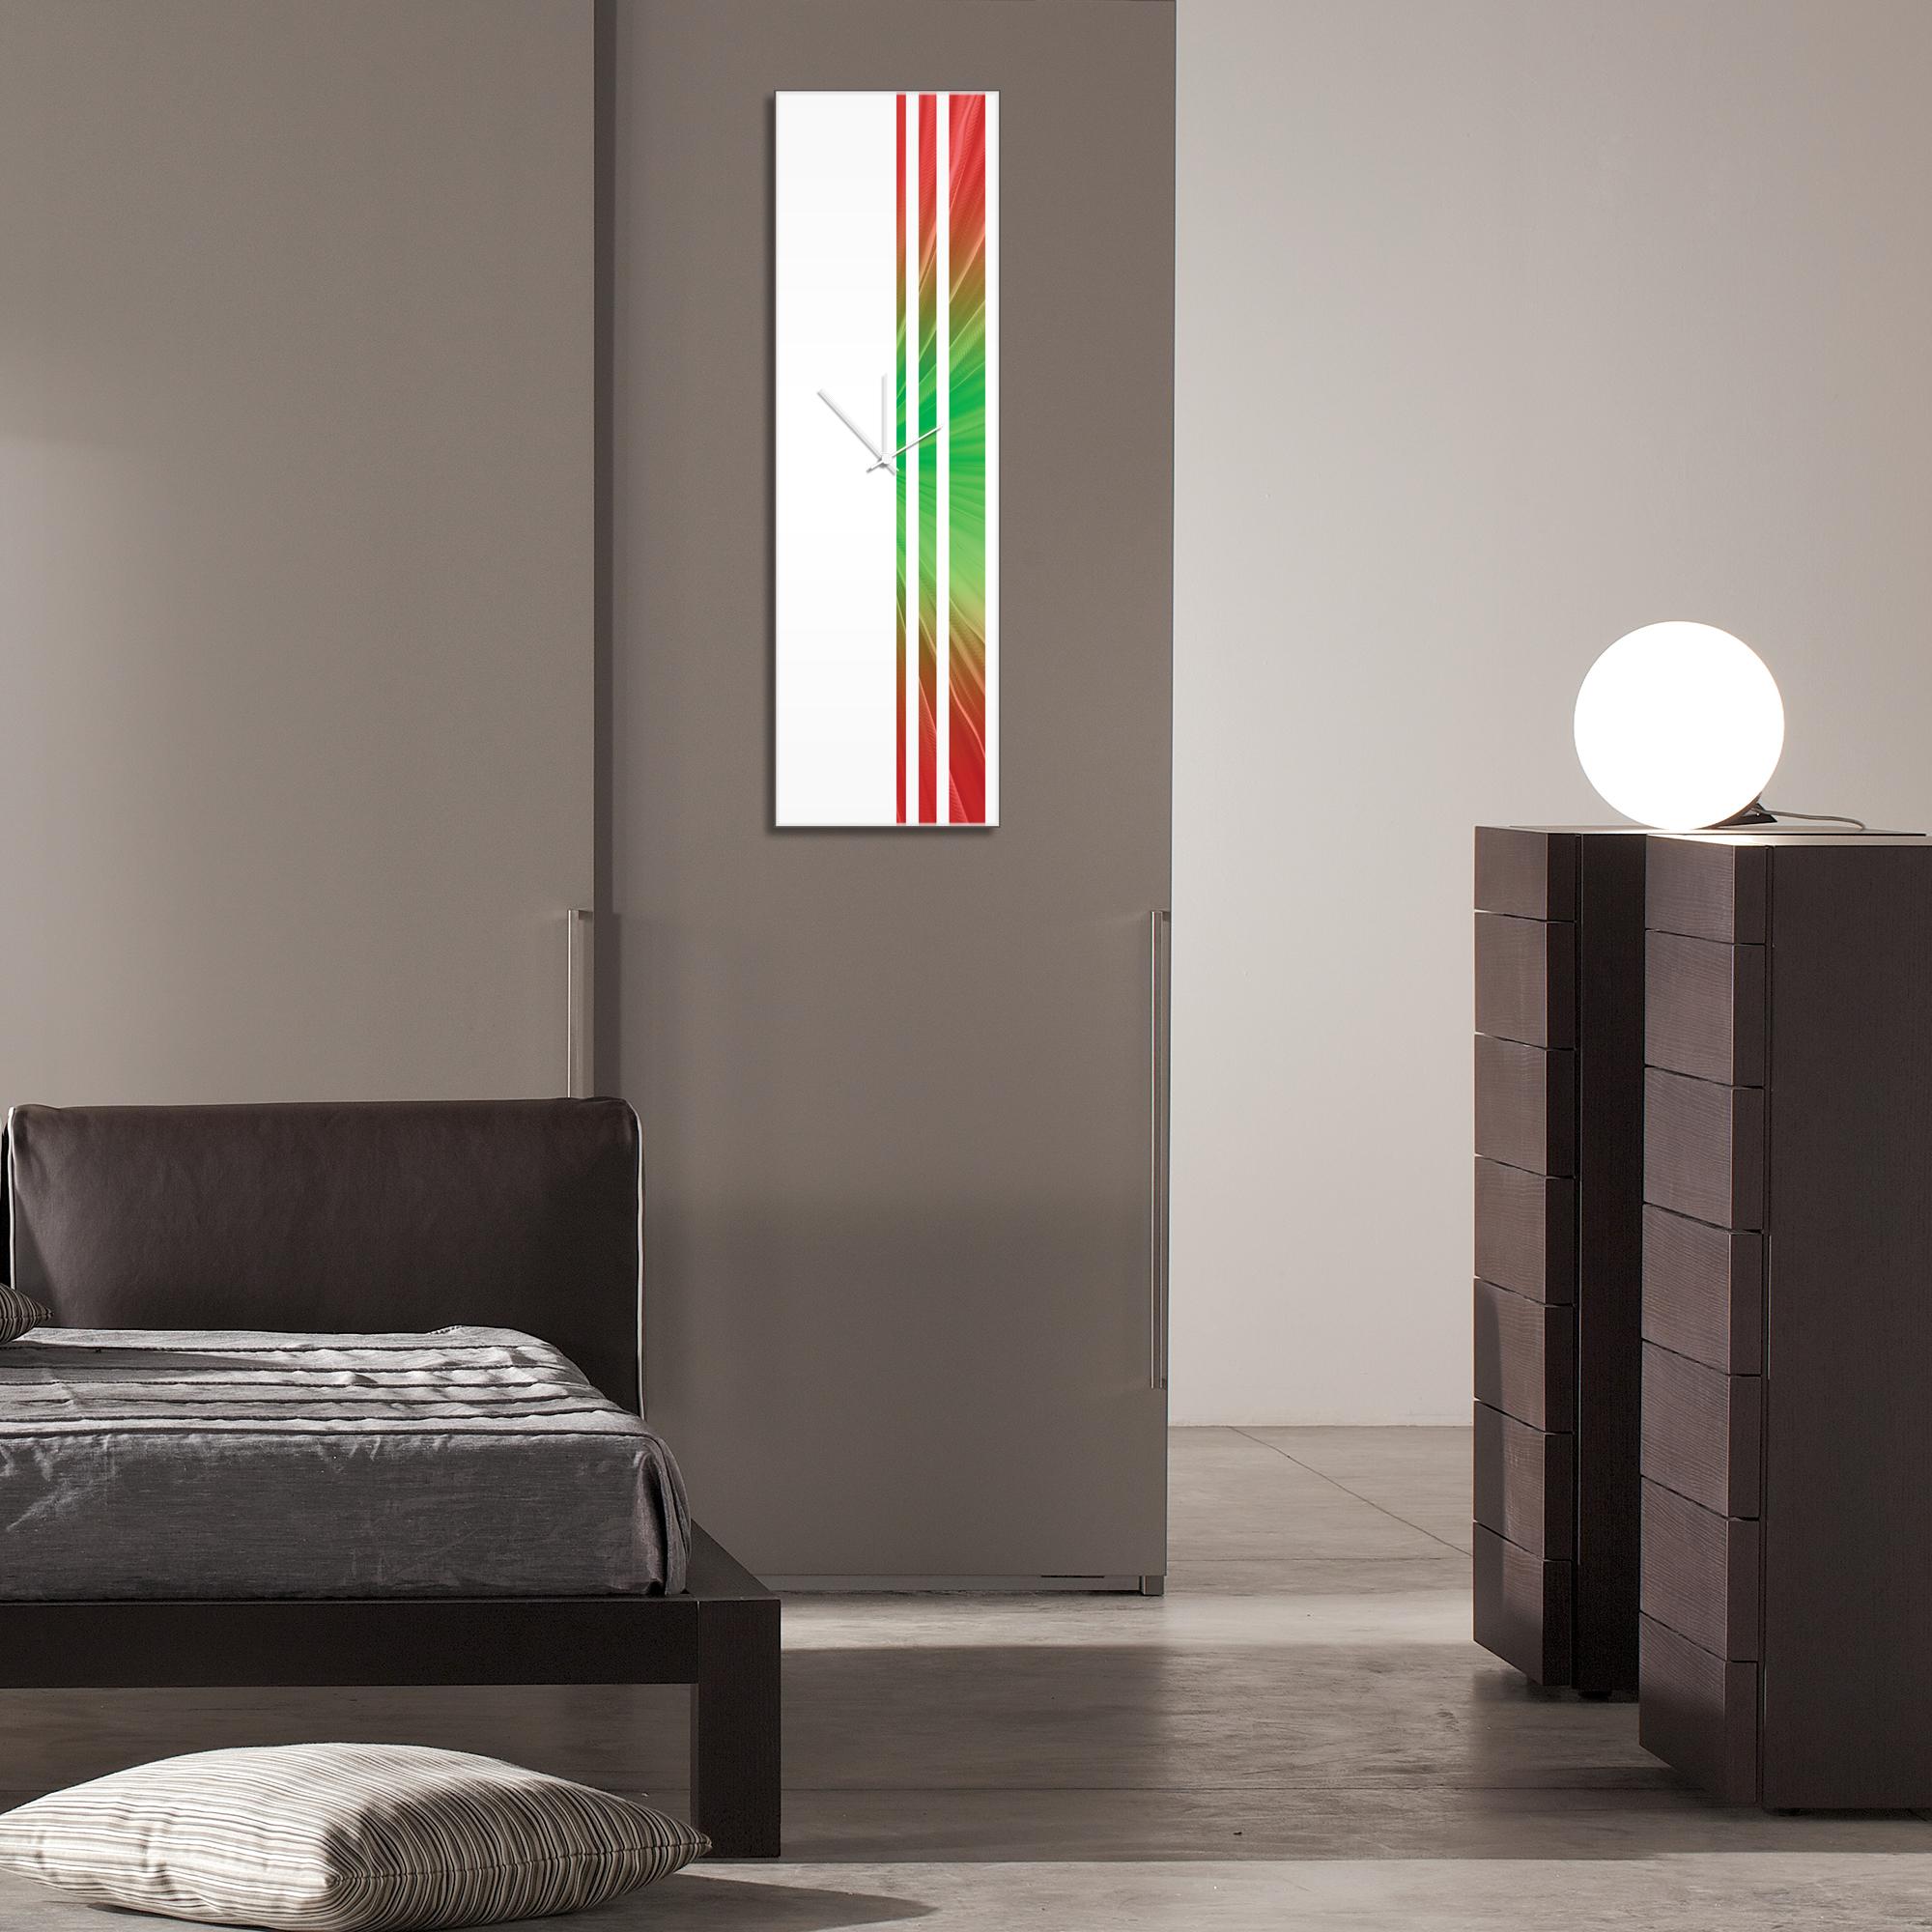 Bloom Triple Stripe Clock by Adam Schwoeppe Large Modern Clock on Acrylic - Alternate View 3